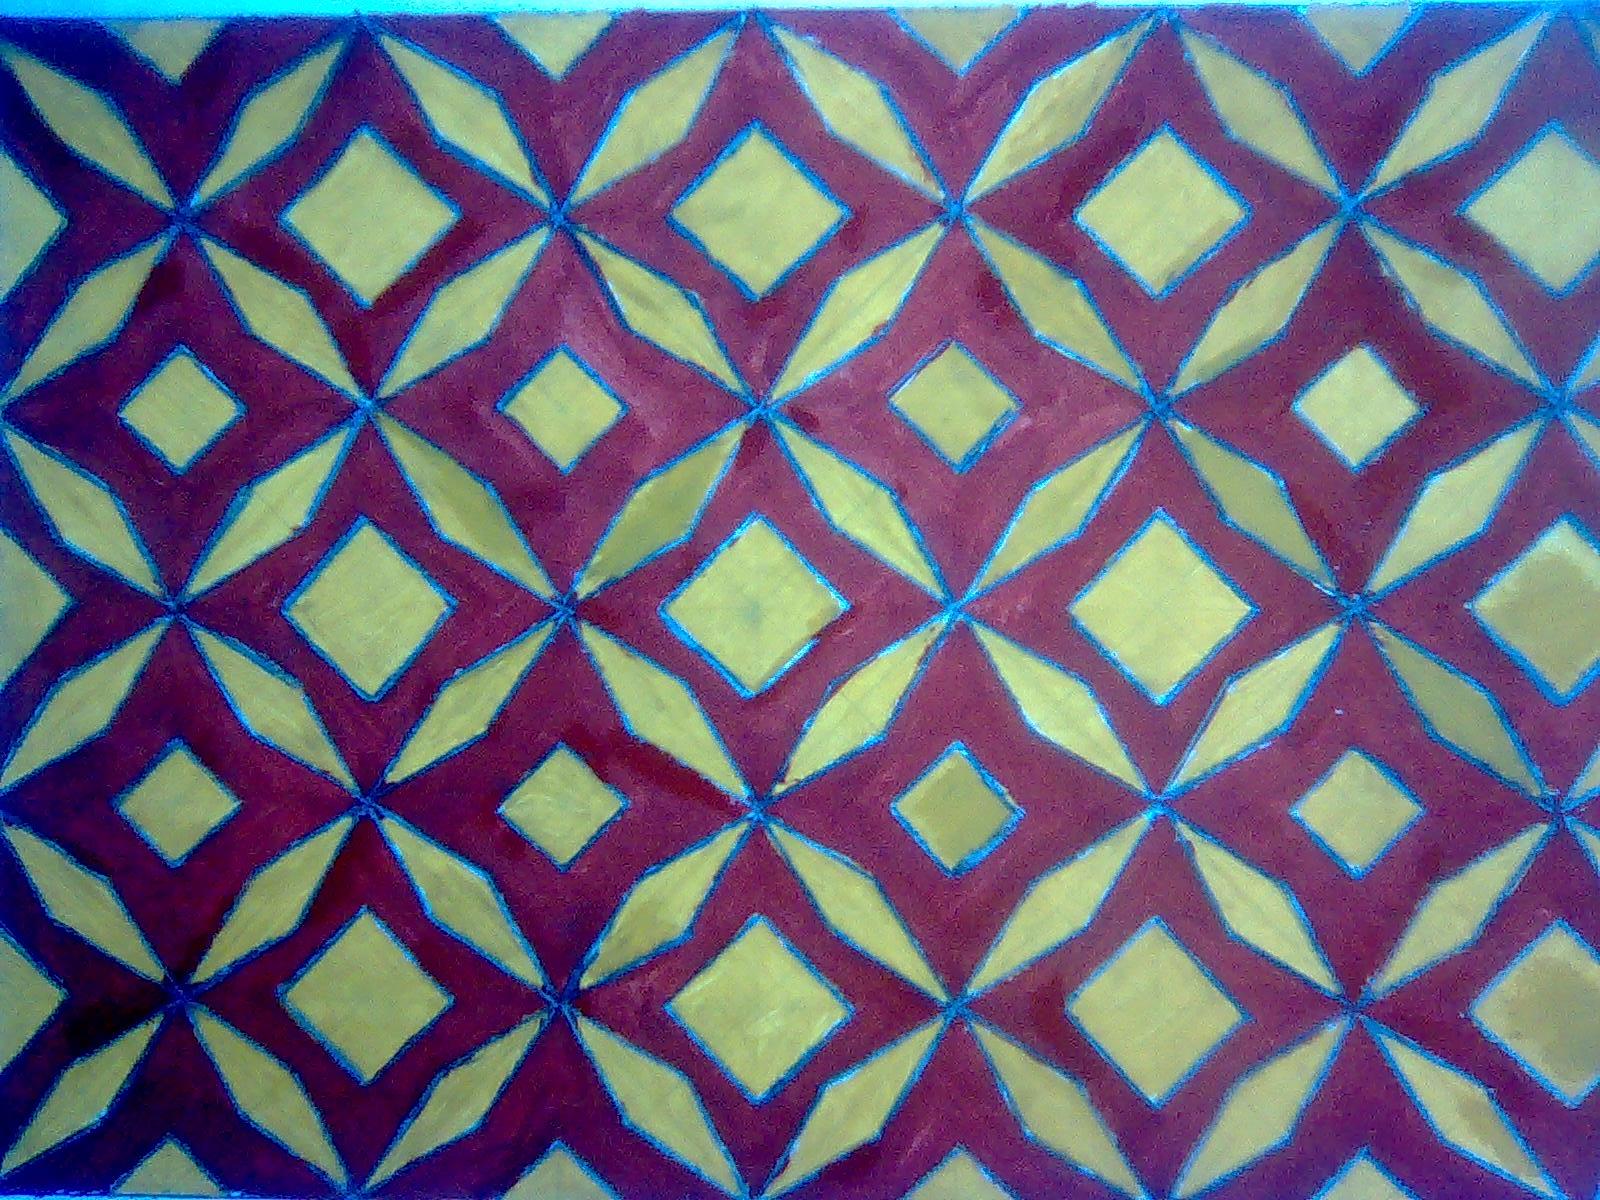 Motif Batik Yang Mudah Digambar Di Kertas Gambar